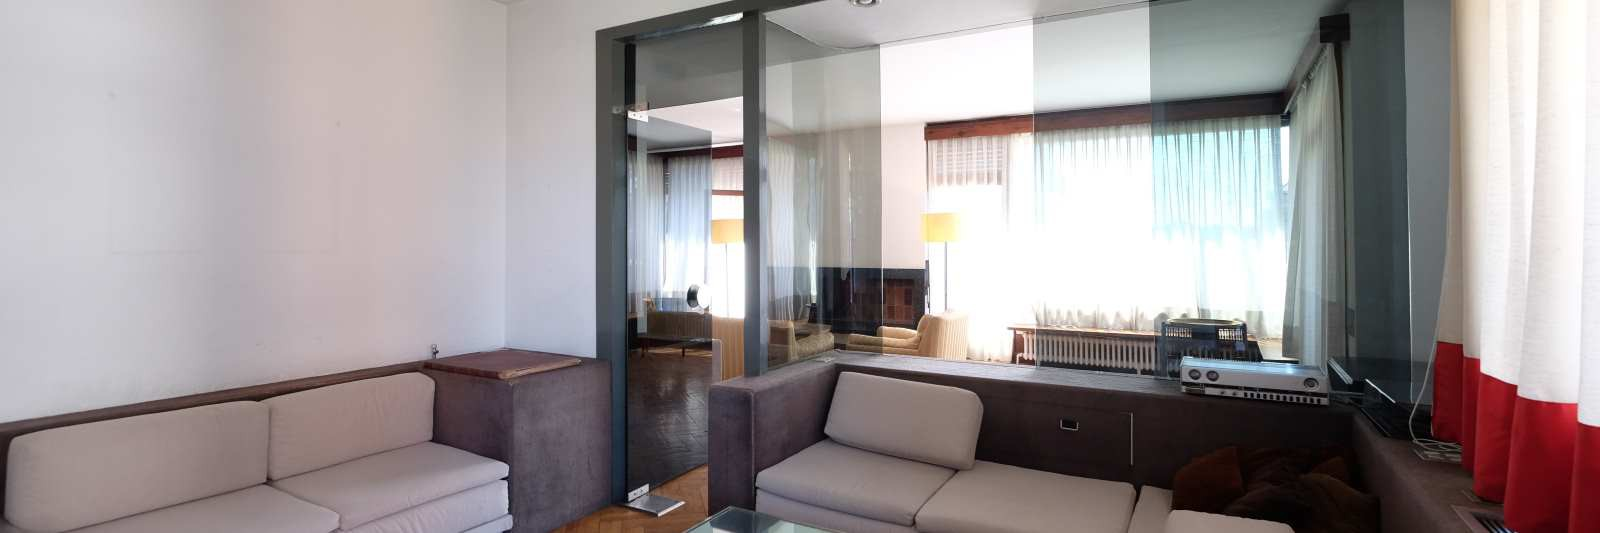 MG Inmobiliaria Barcelona - trestorrescalatrava